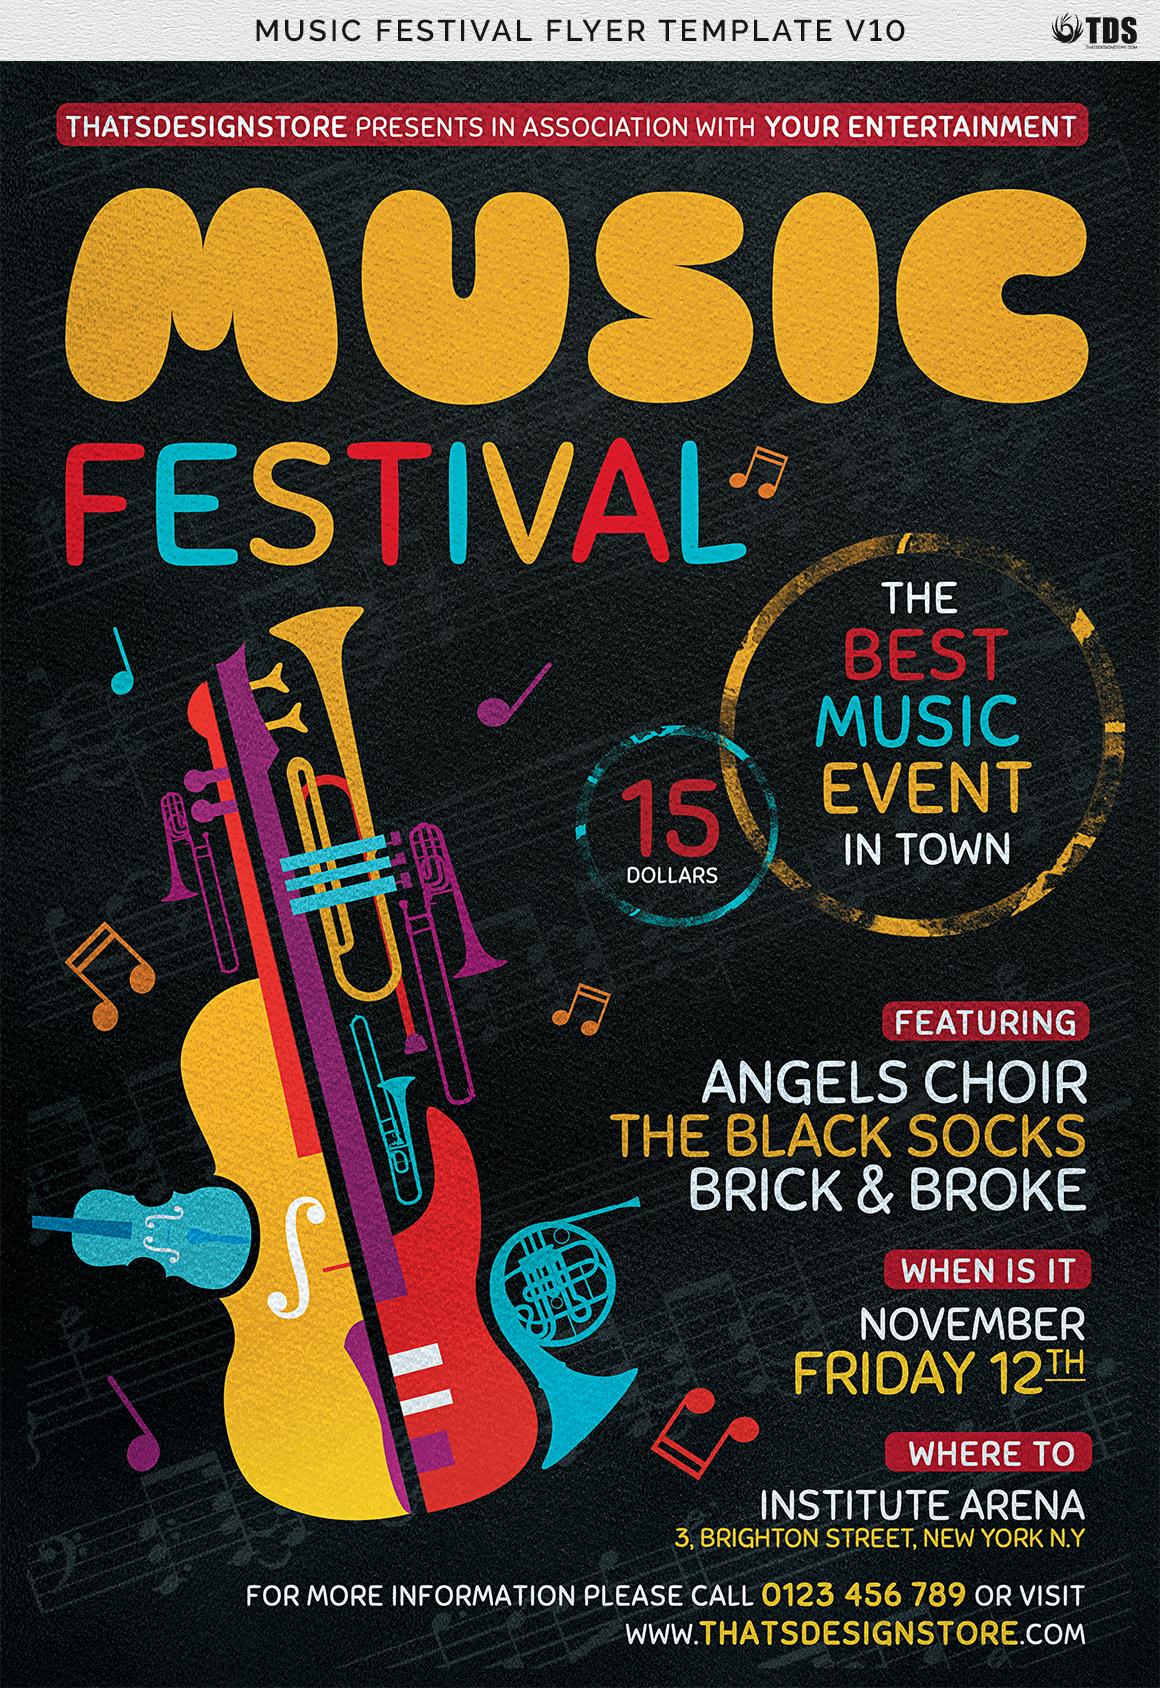 Music Festival Flyer Template V10 example image 7